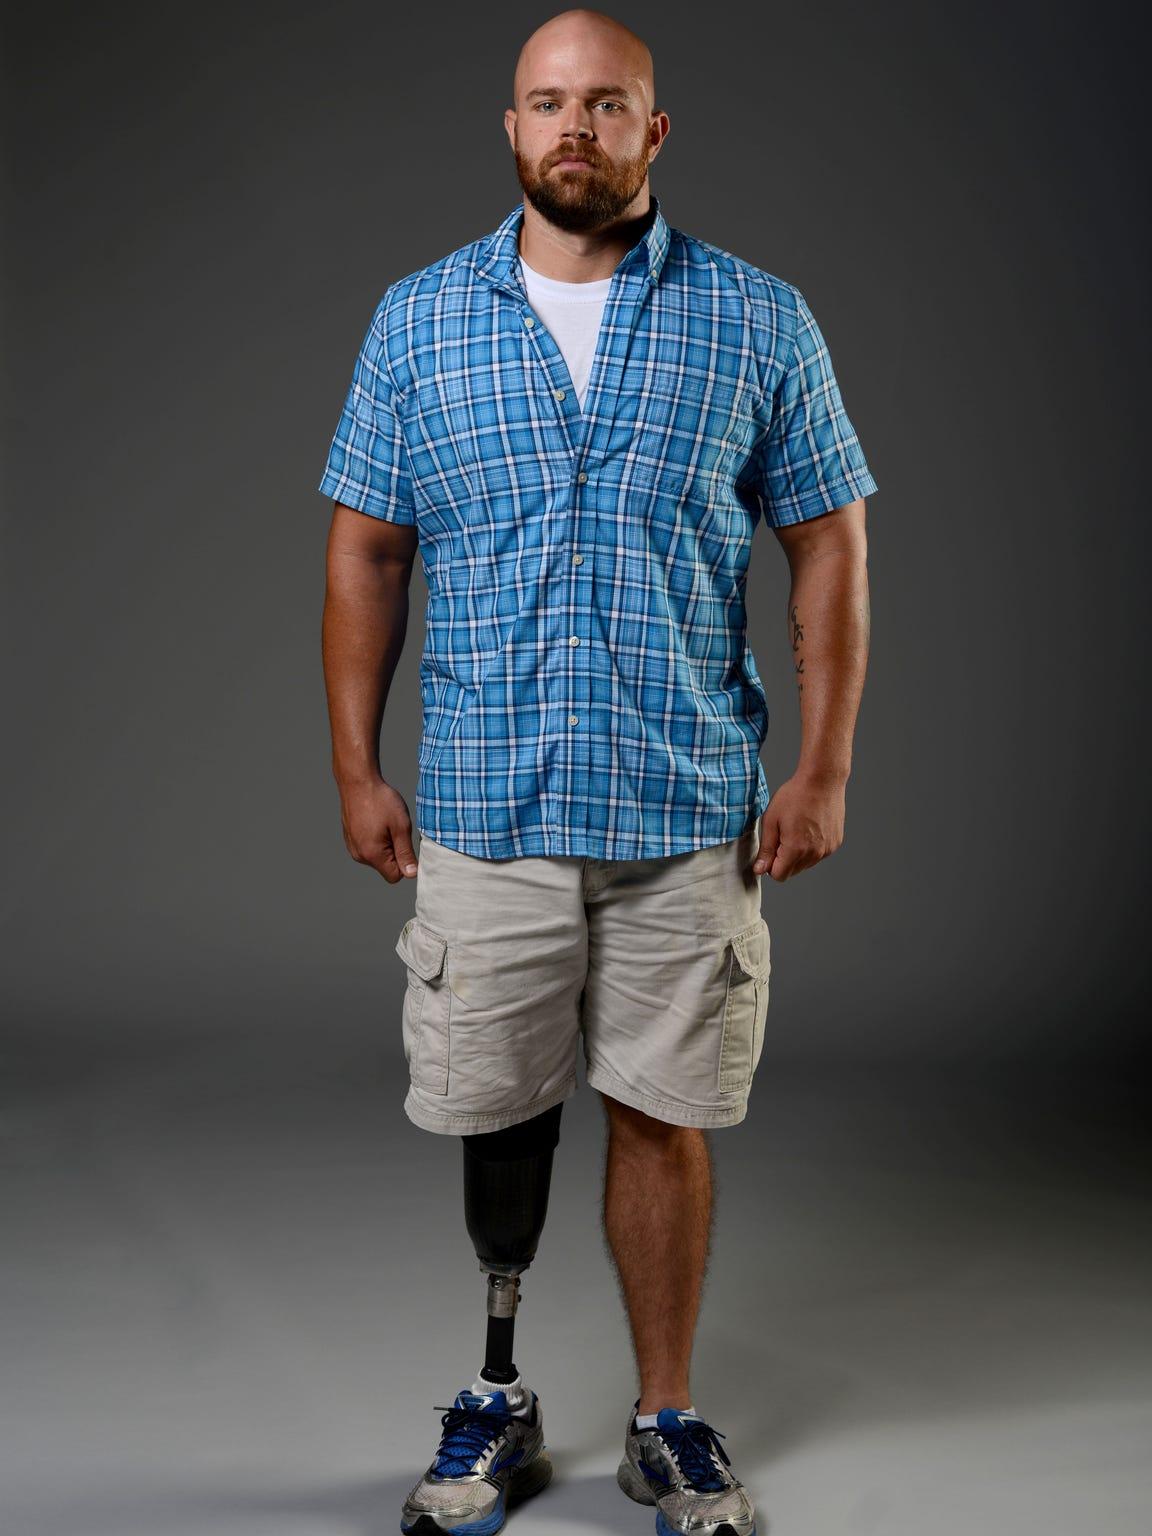 Army veteran Elliott James for years avoided seeking